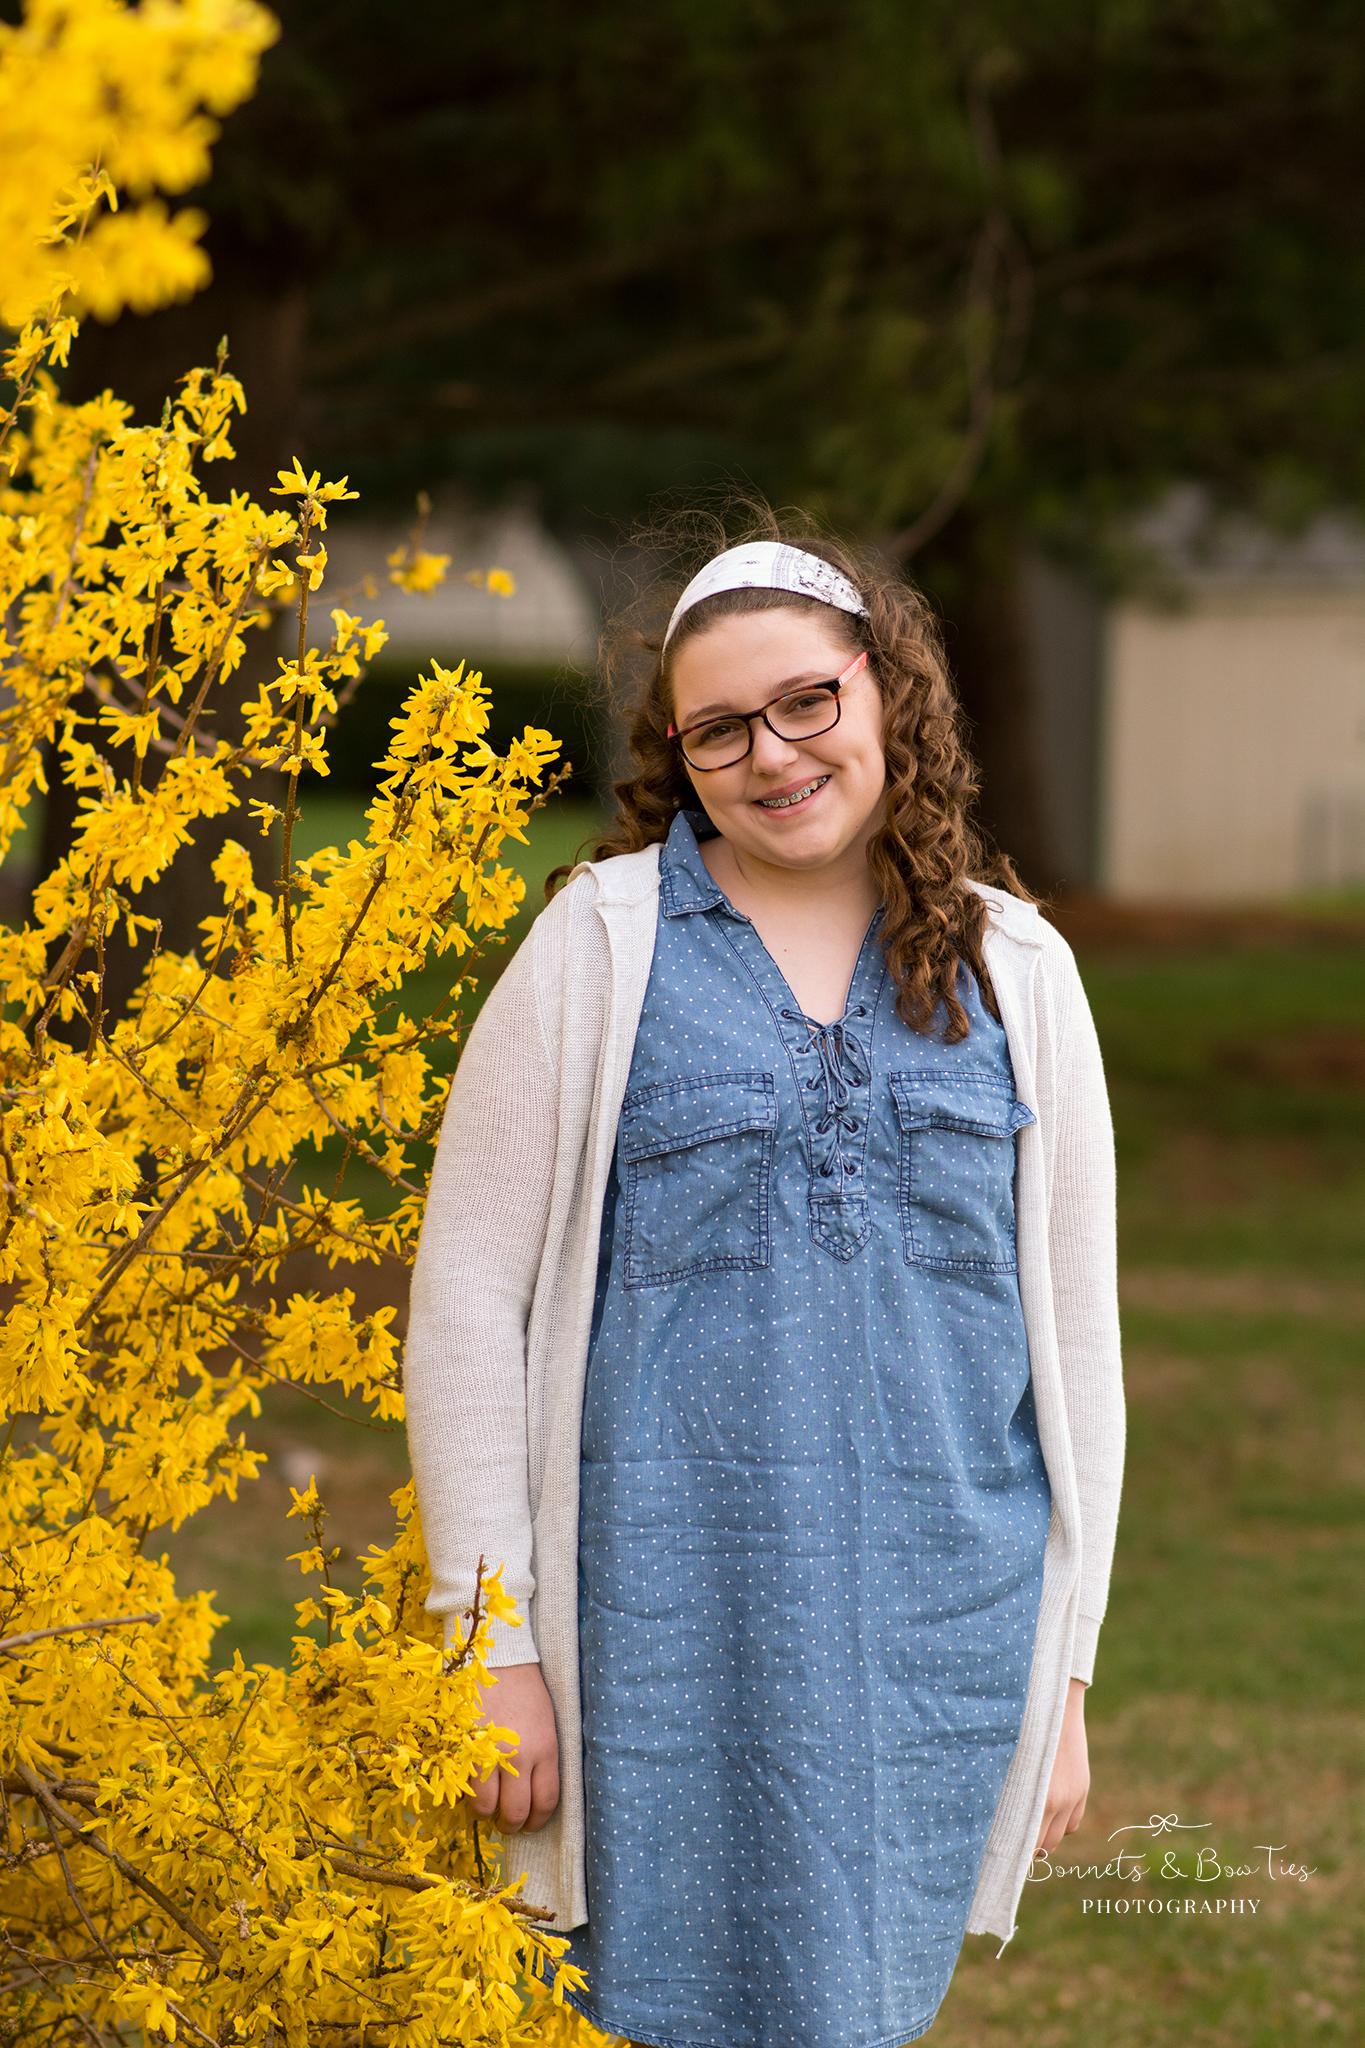 girl wearing blue against yellow flowers.jpg